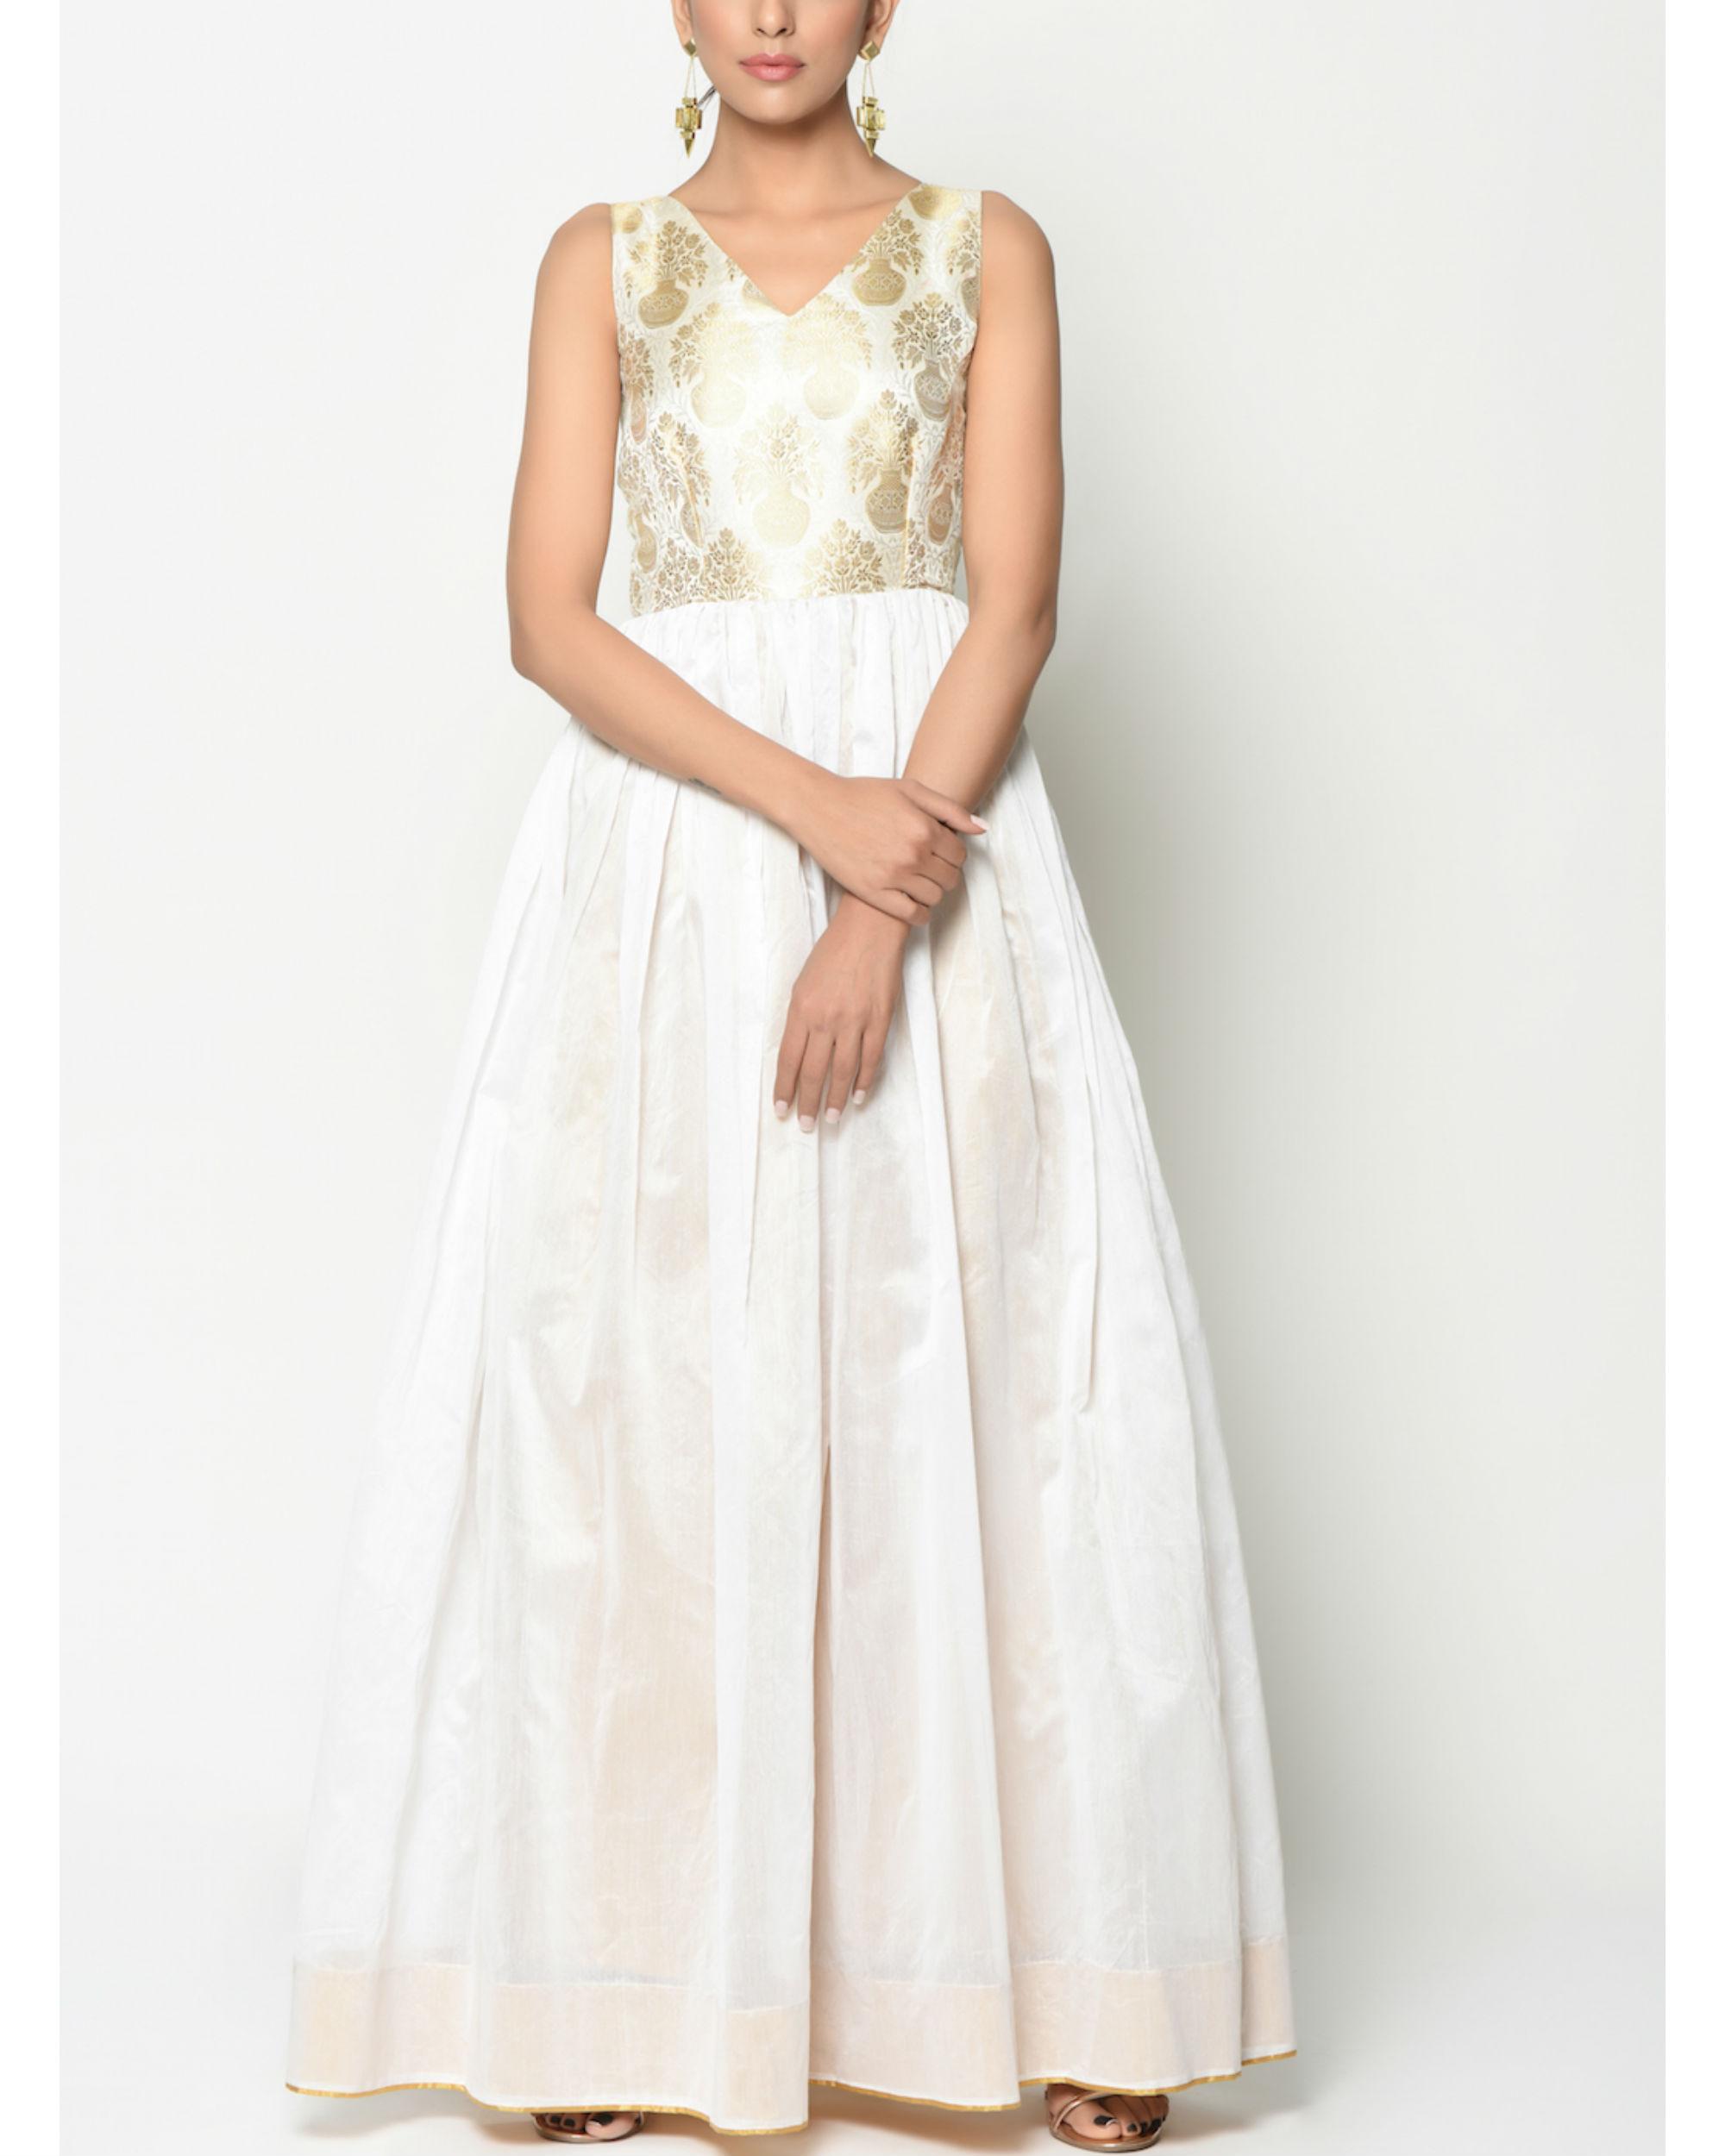 White brocade flare dress